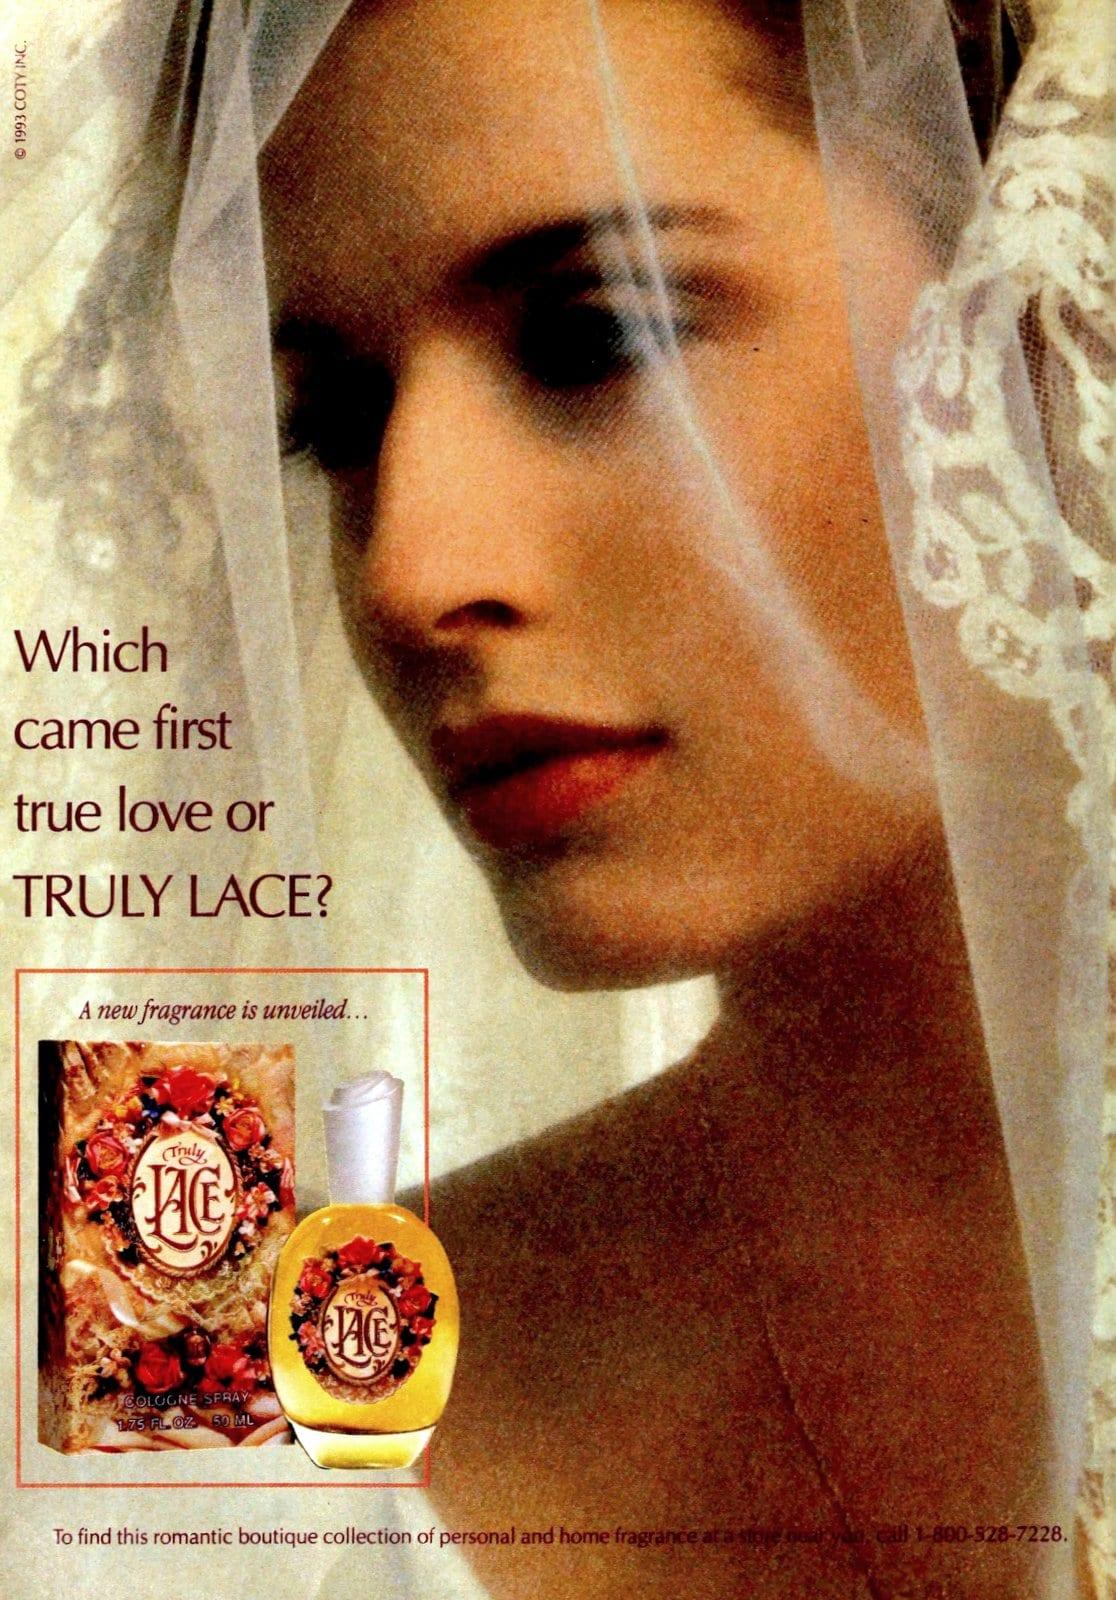 Truly Lace perfume (1993) at ClickAmericana.com